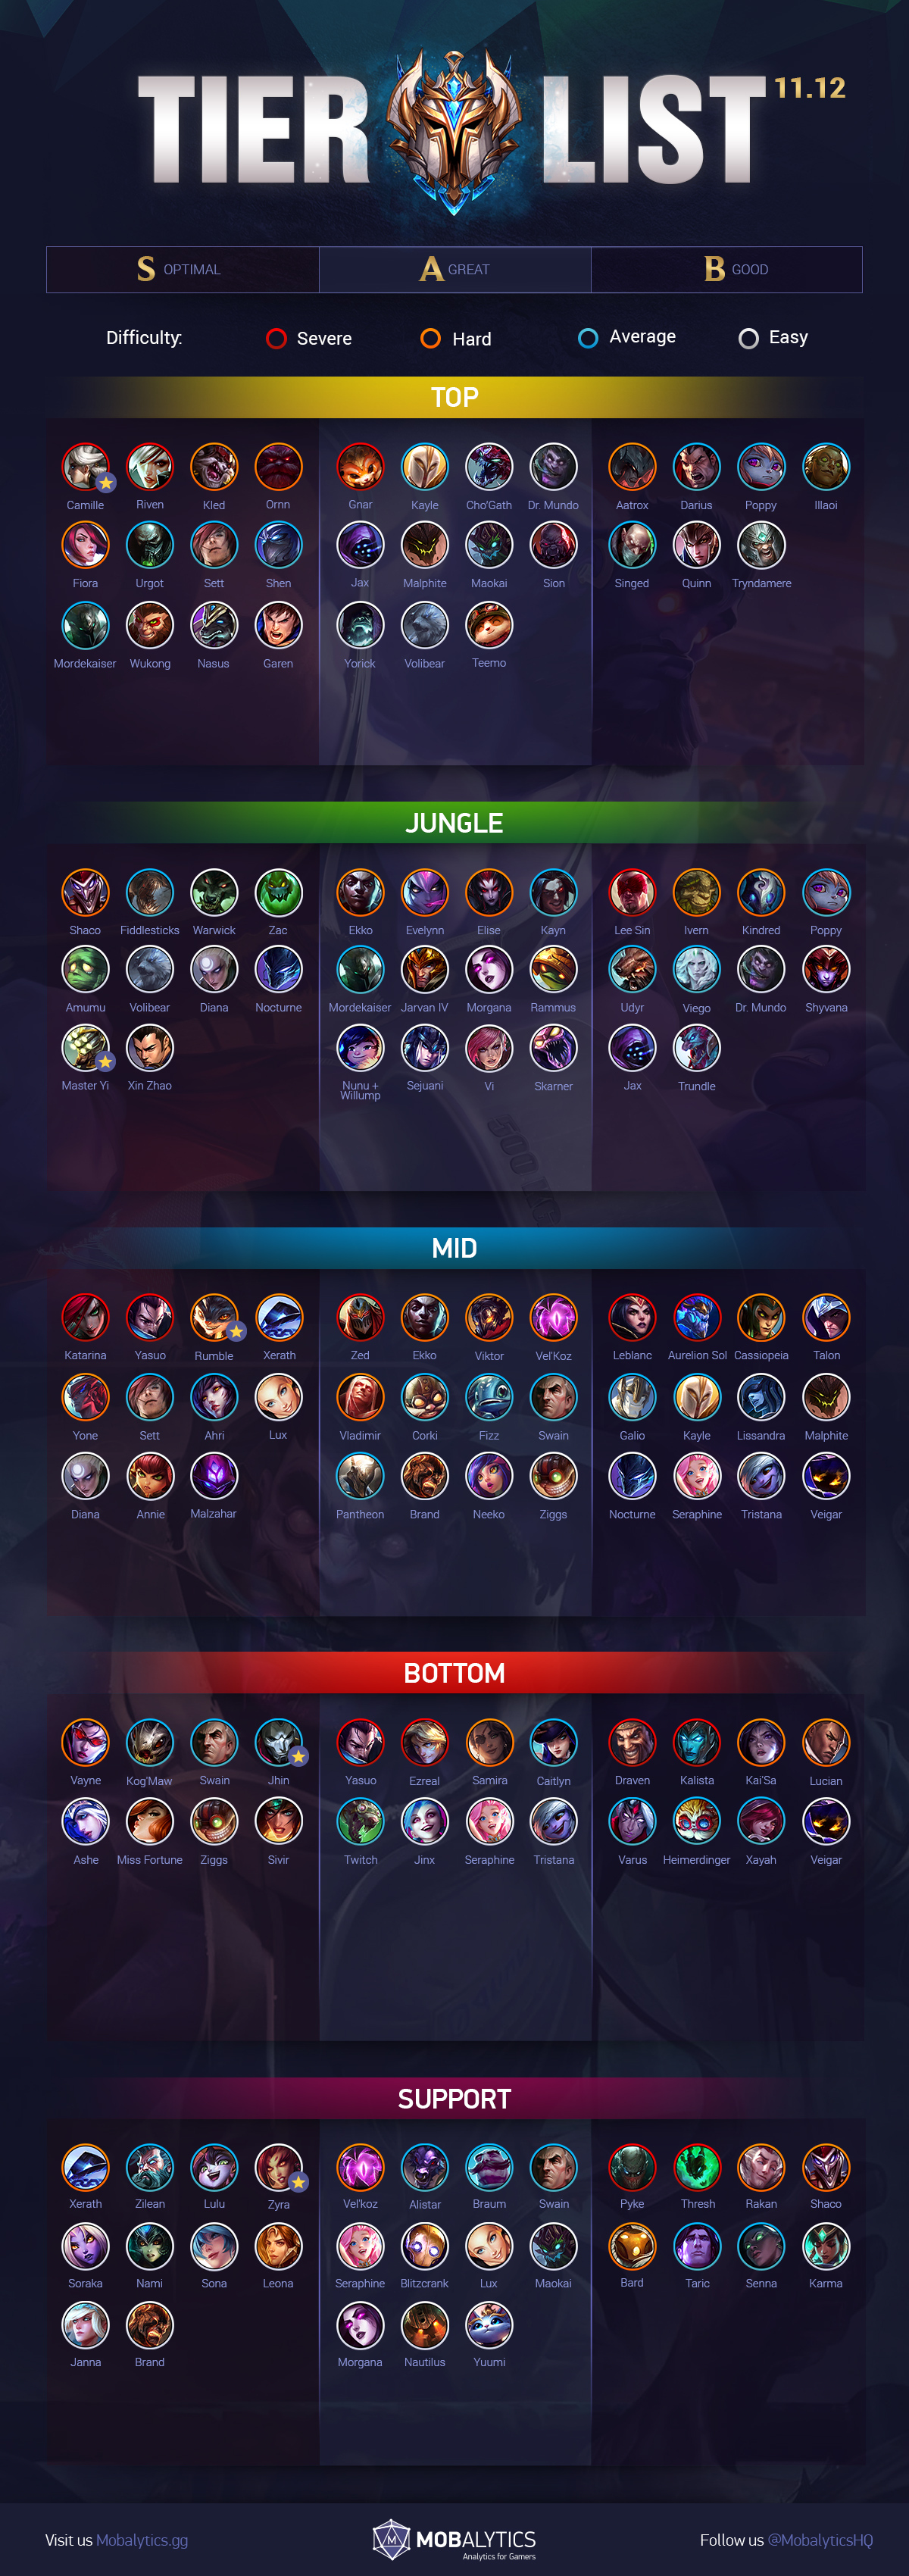 LoL Tier List Patch 11.12